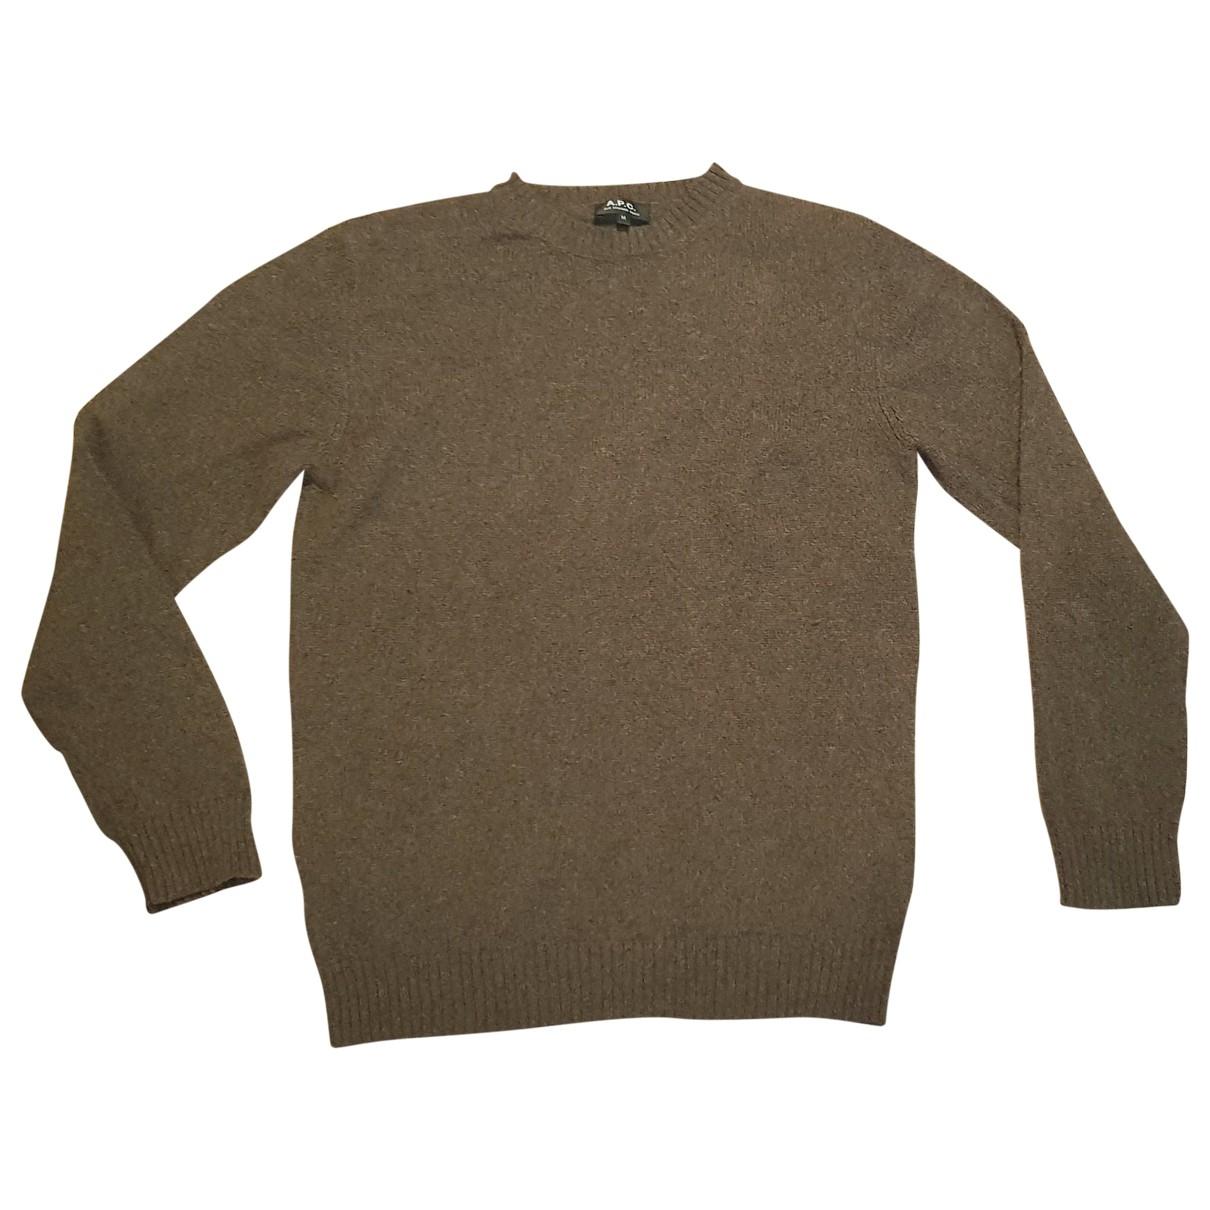 Apc \N Brown Knitwear & Sweatshirts for Men M International